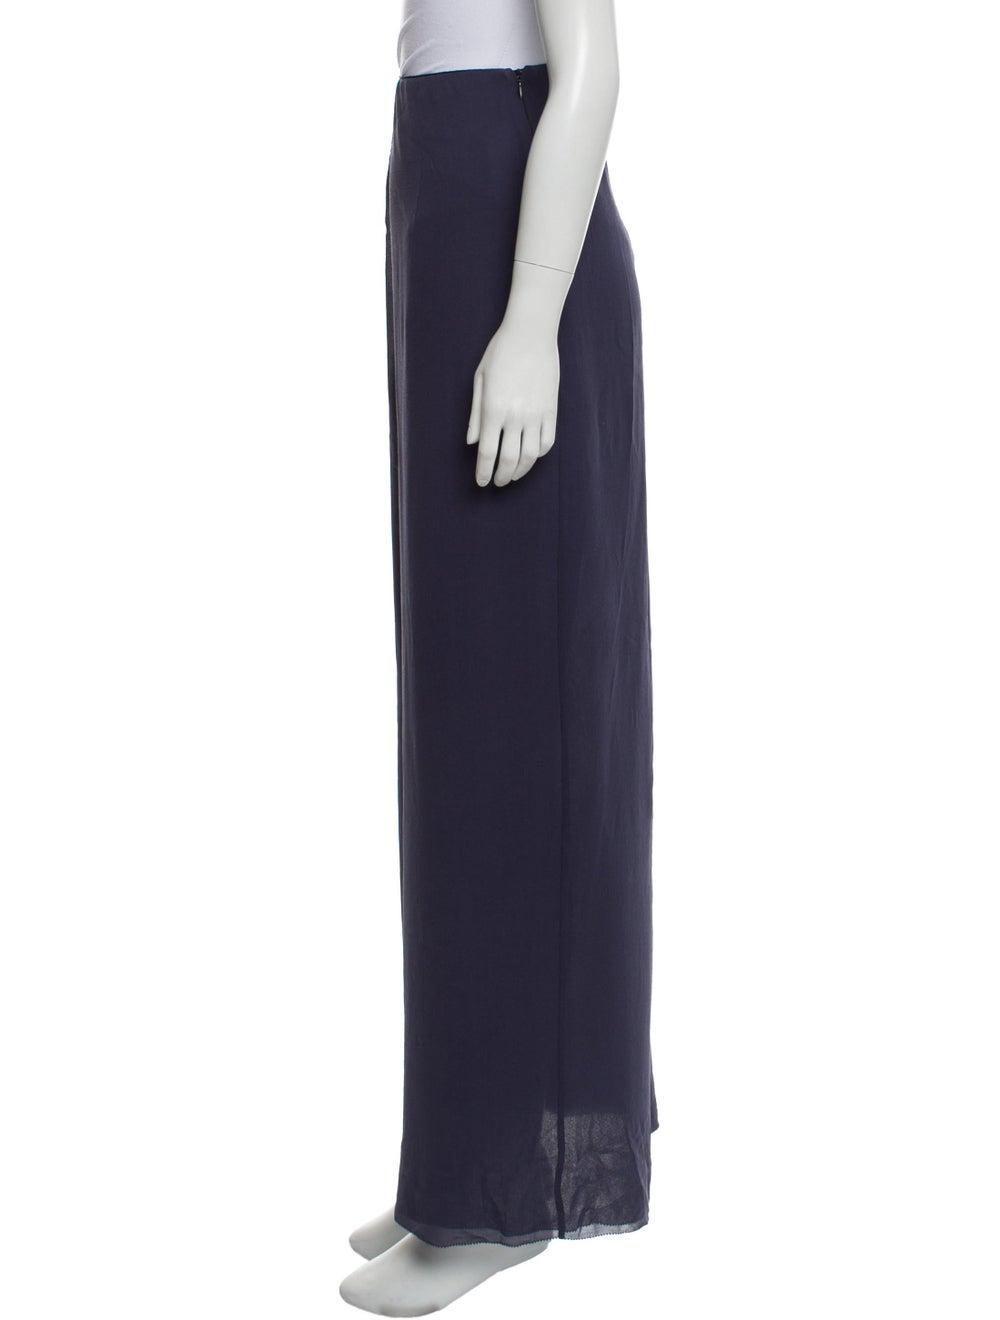 Acne Studios Slit Maxi Skirt Blue - image 2